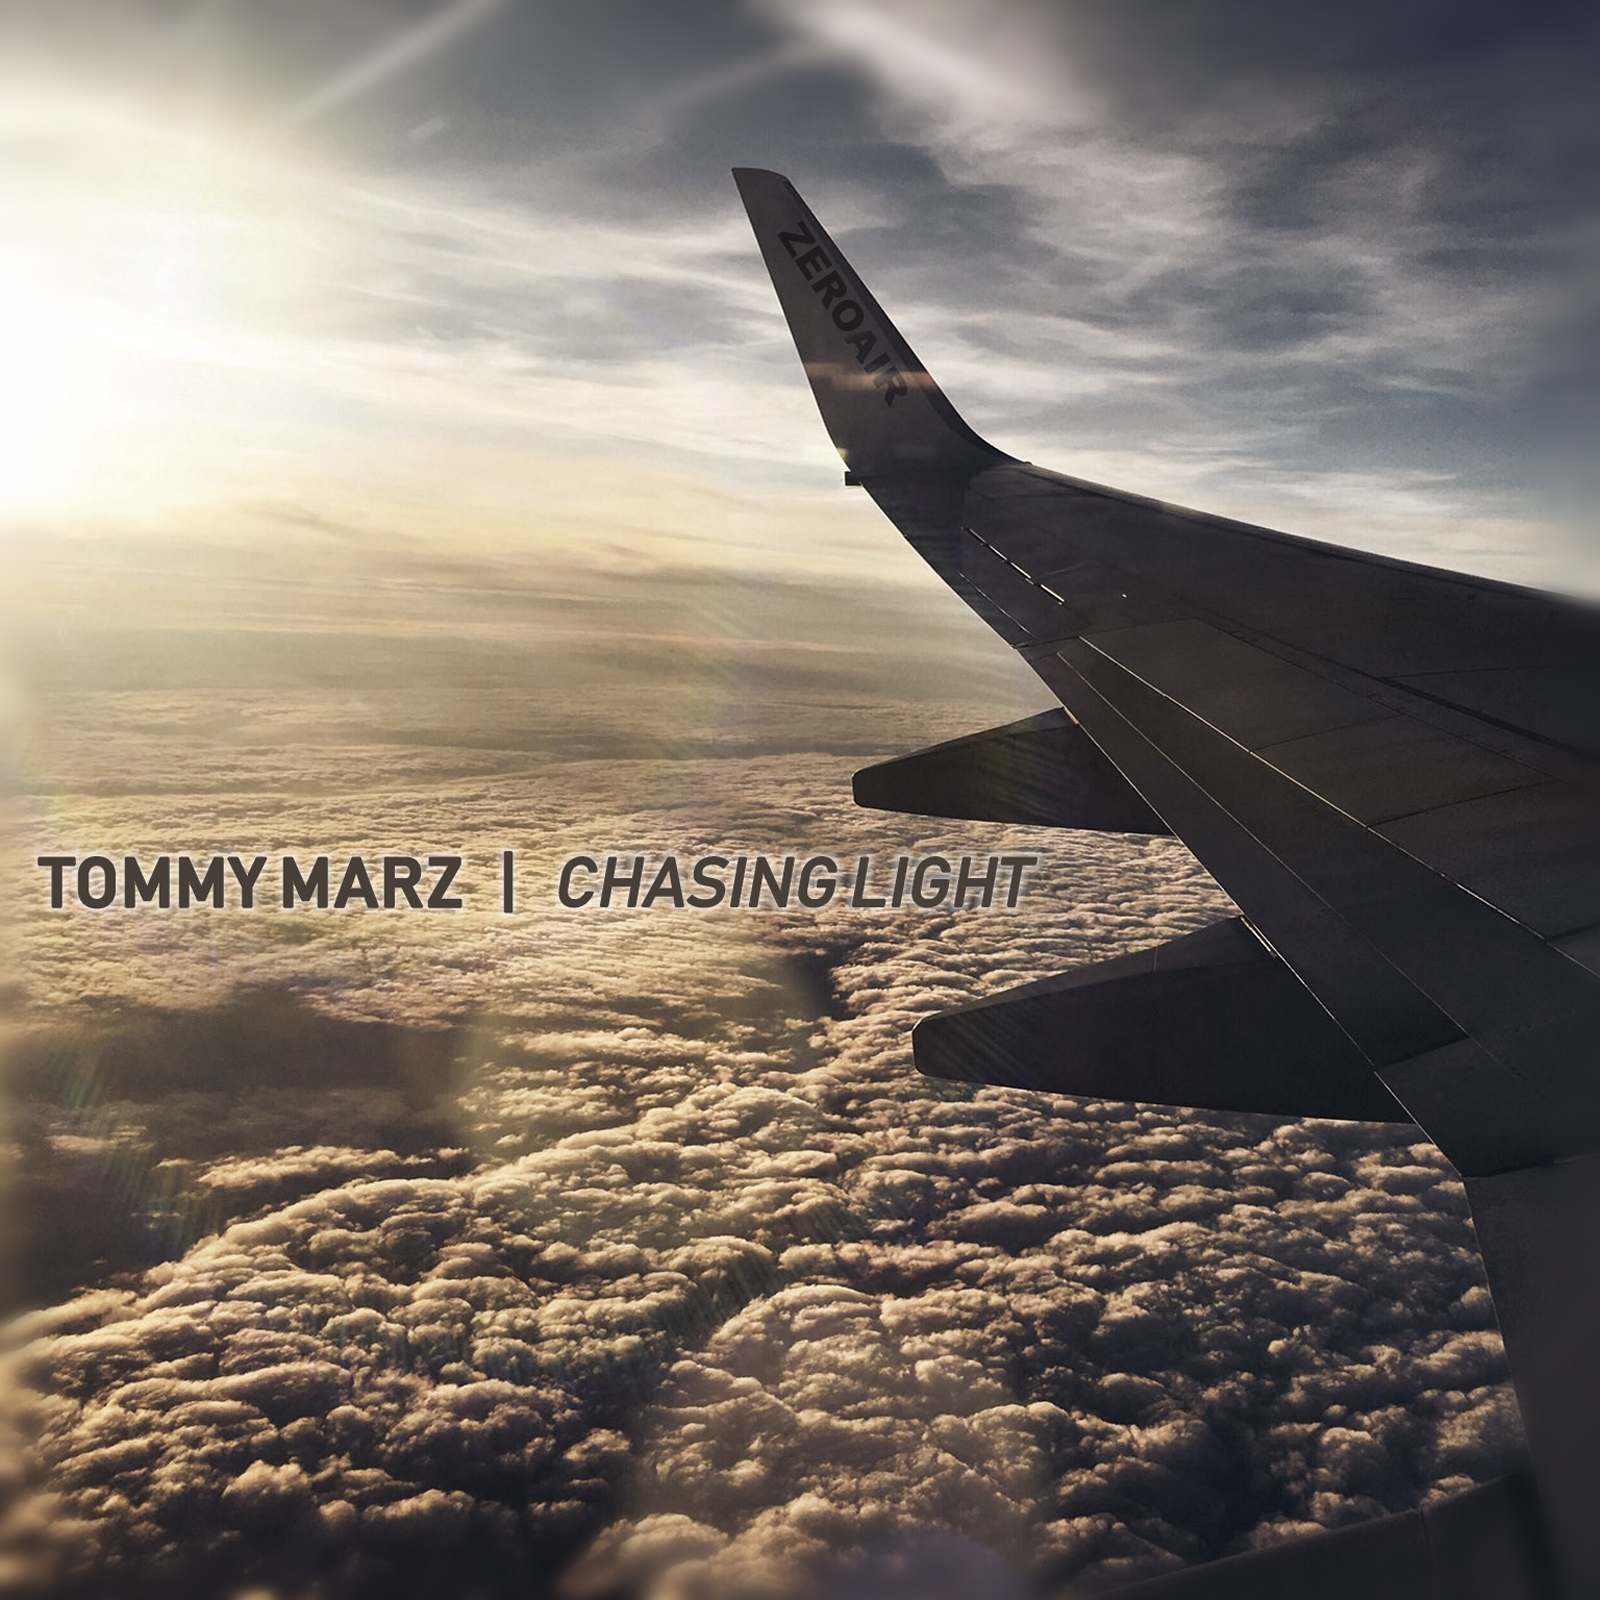 Chasing Light Image